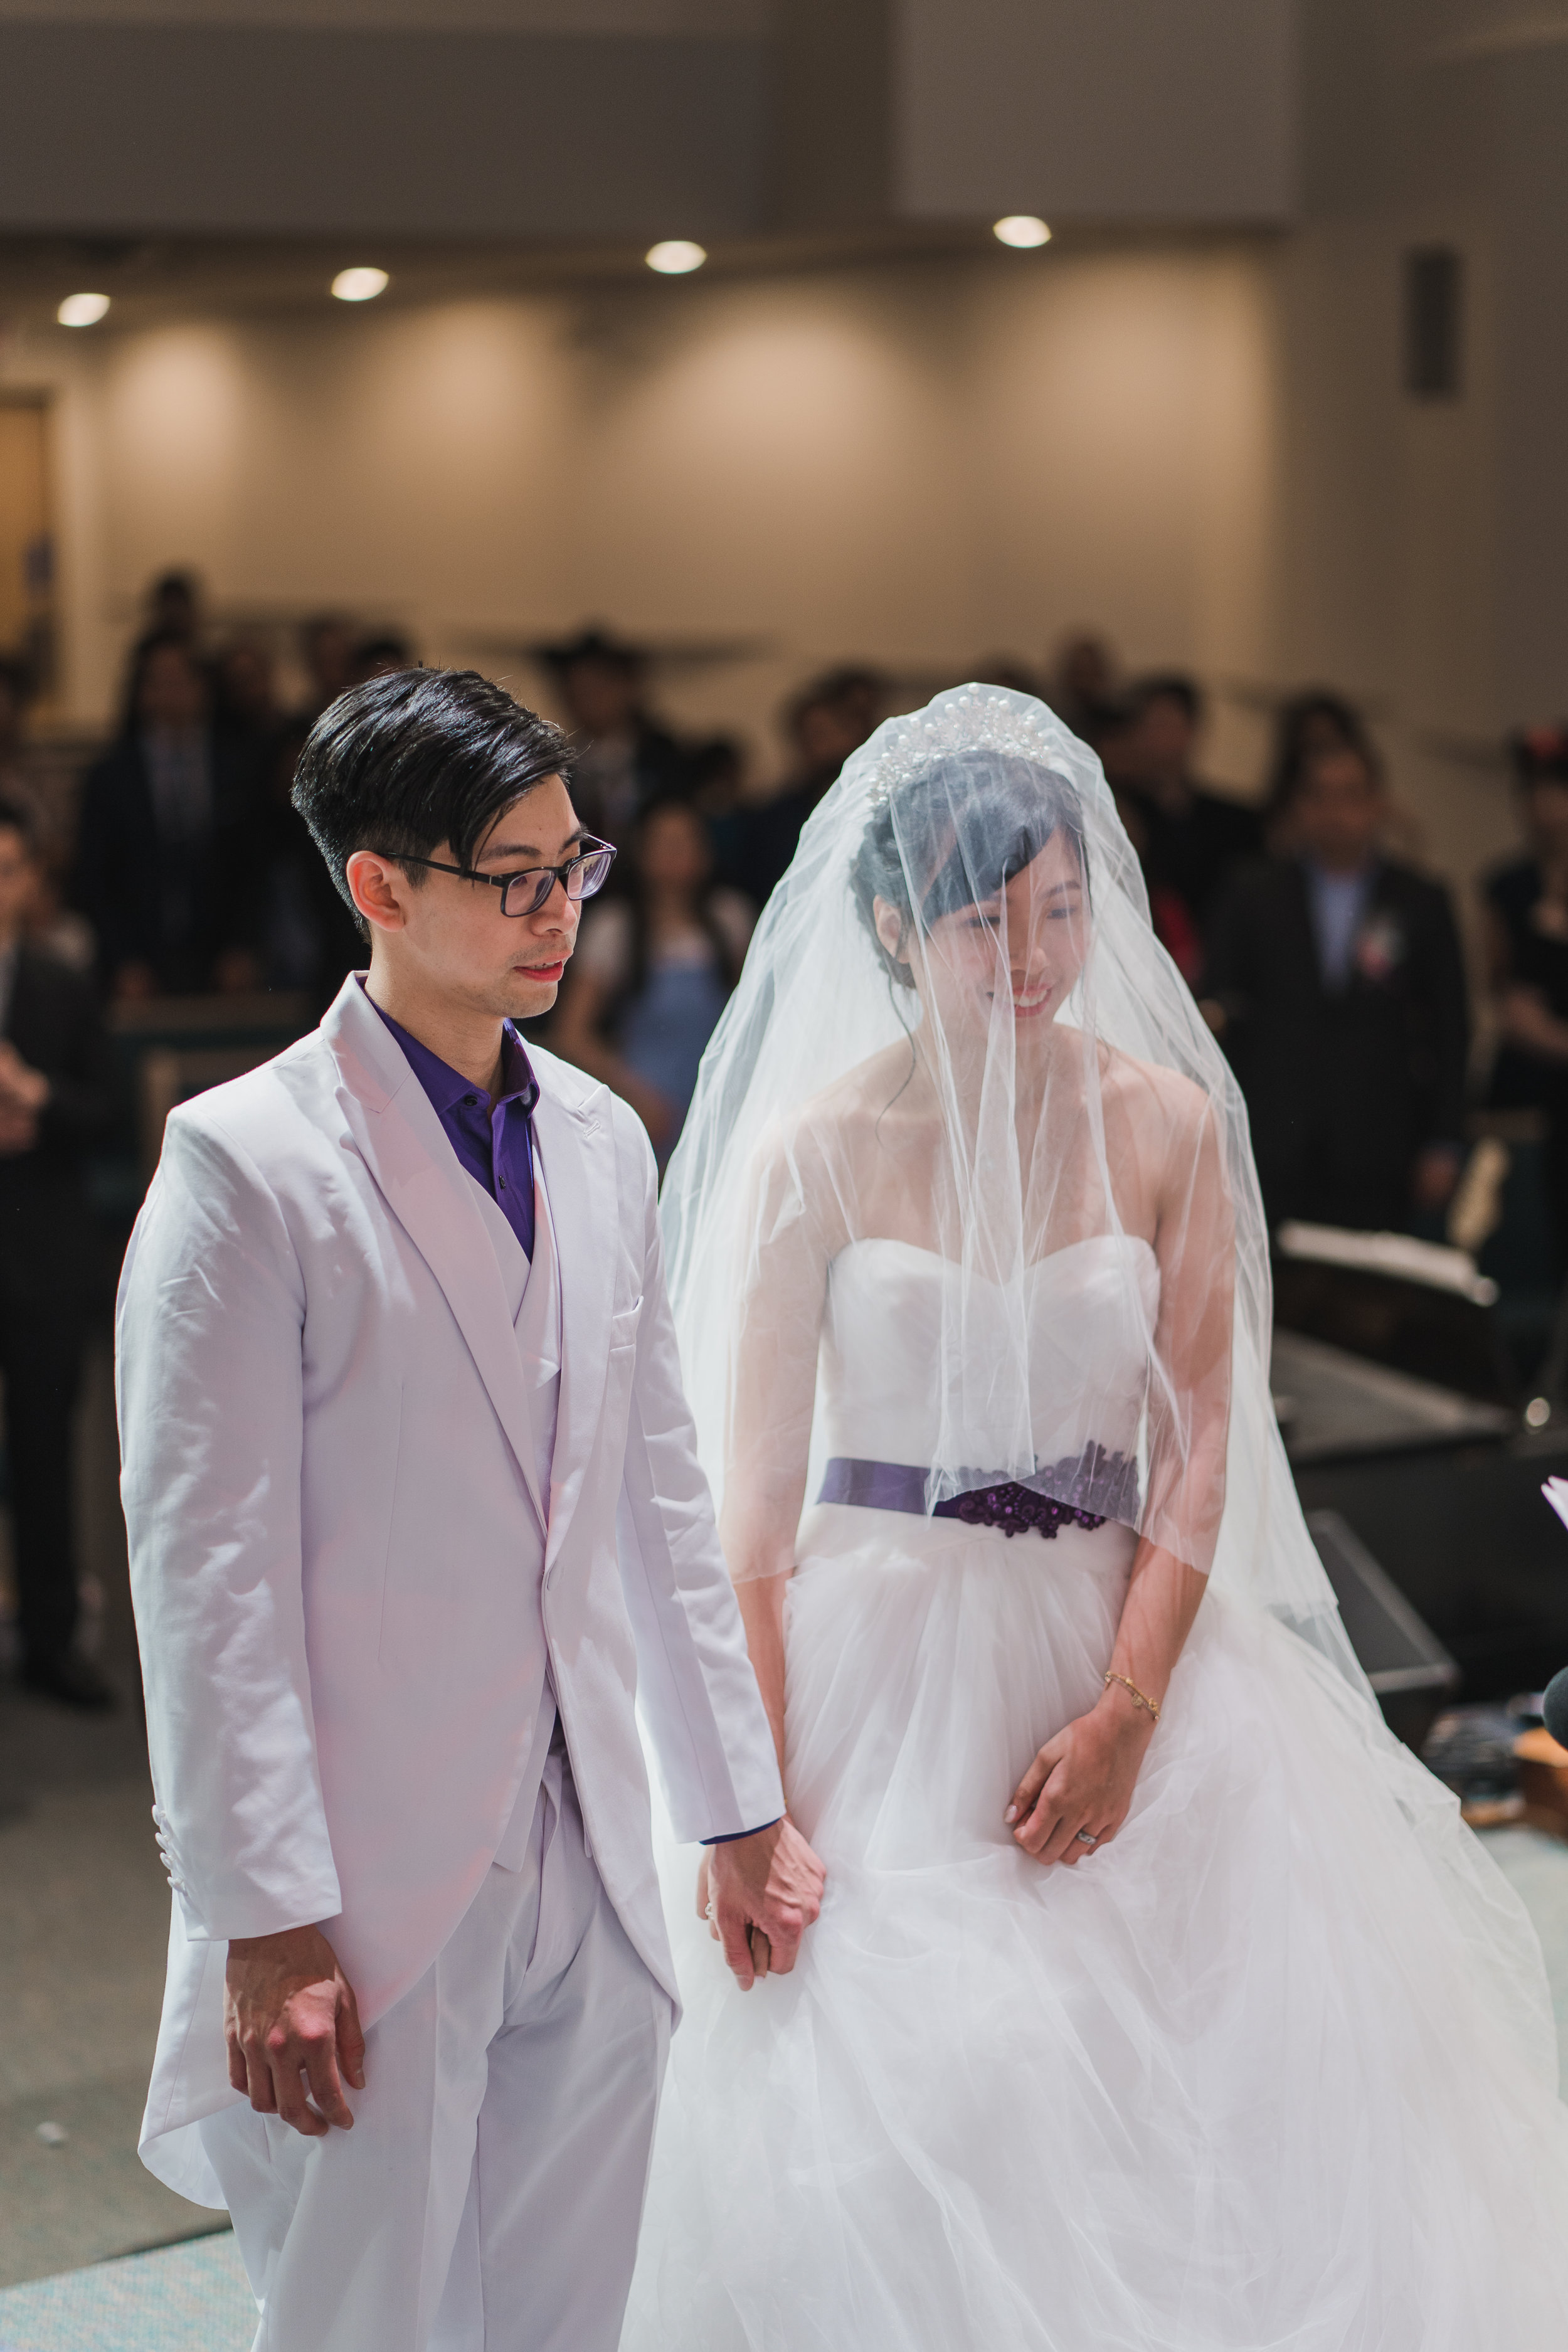 20190520 - Pamela & Matthew Wedding - 0154.jpg